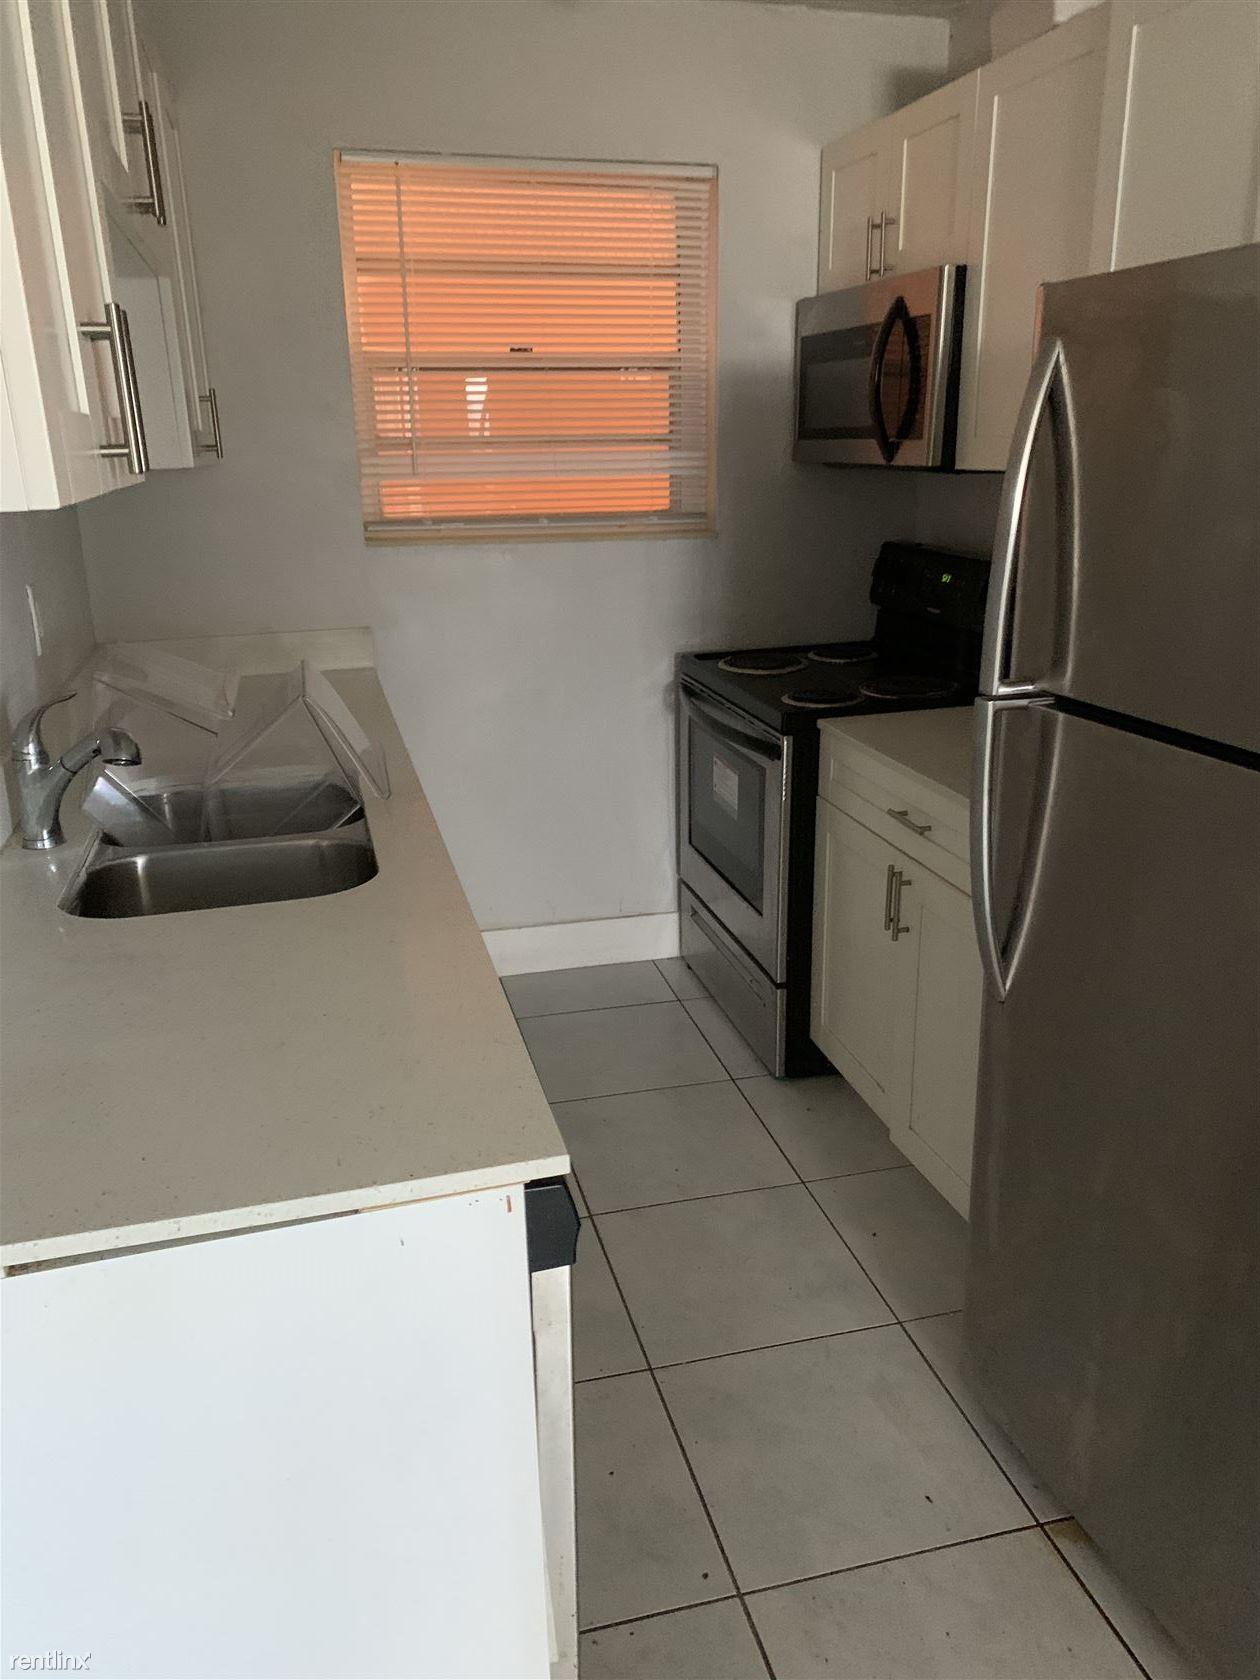 580 NE 127th St for rent